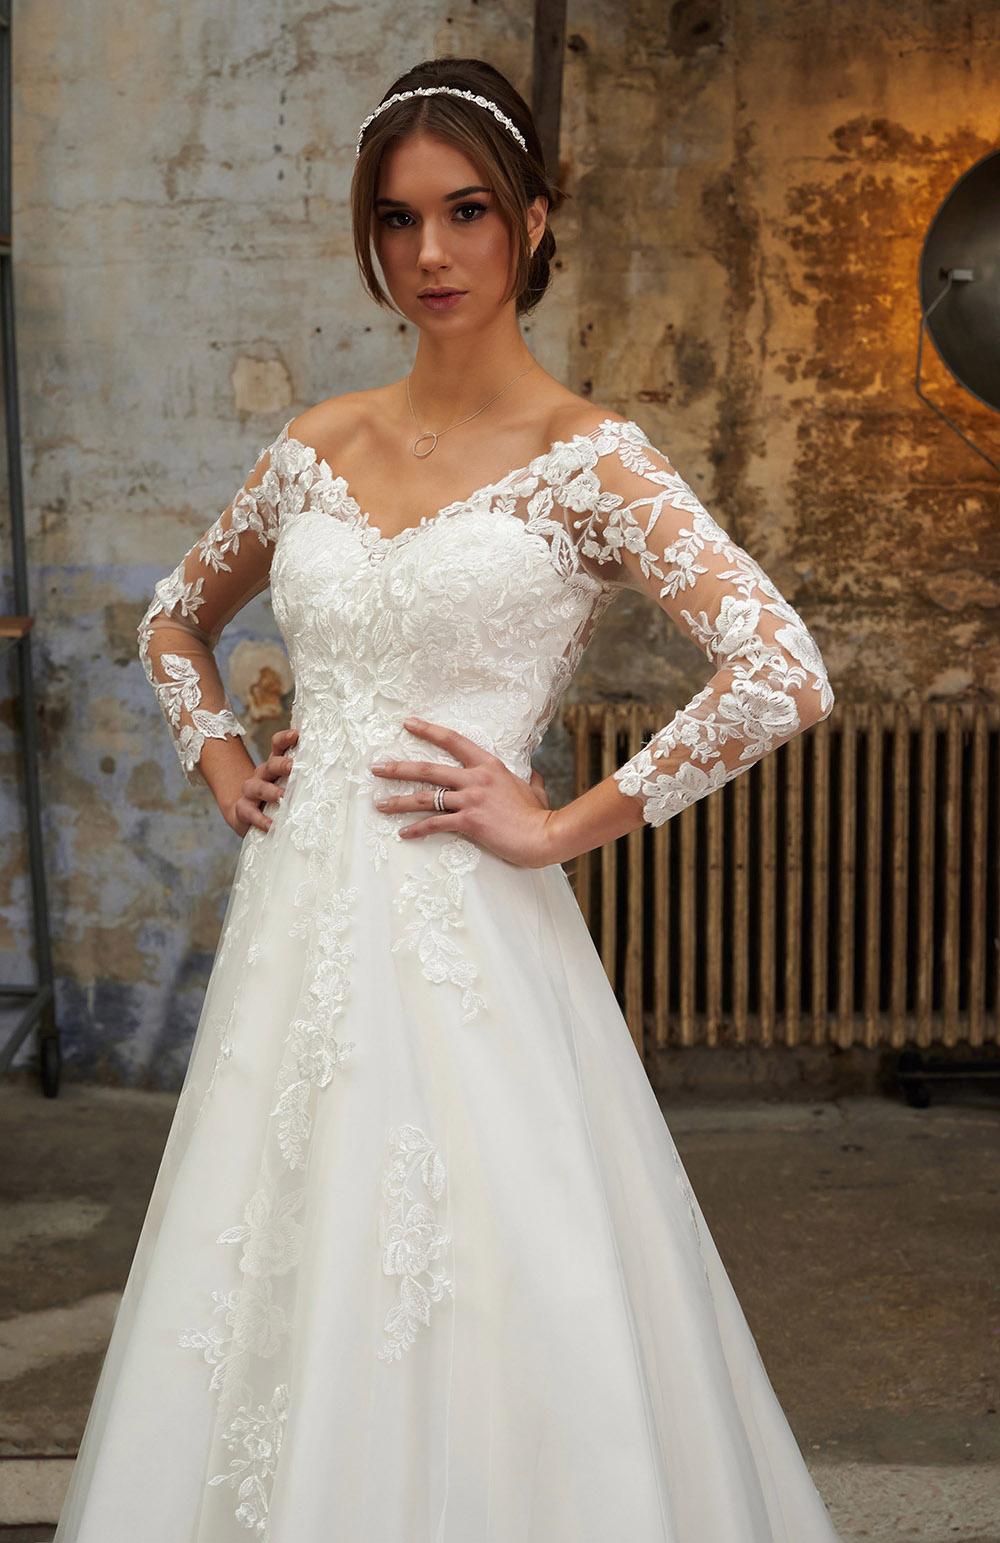 Robes de mariée style Tulle - Organza & Dentelle